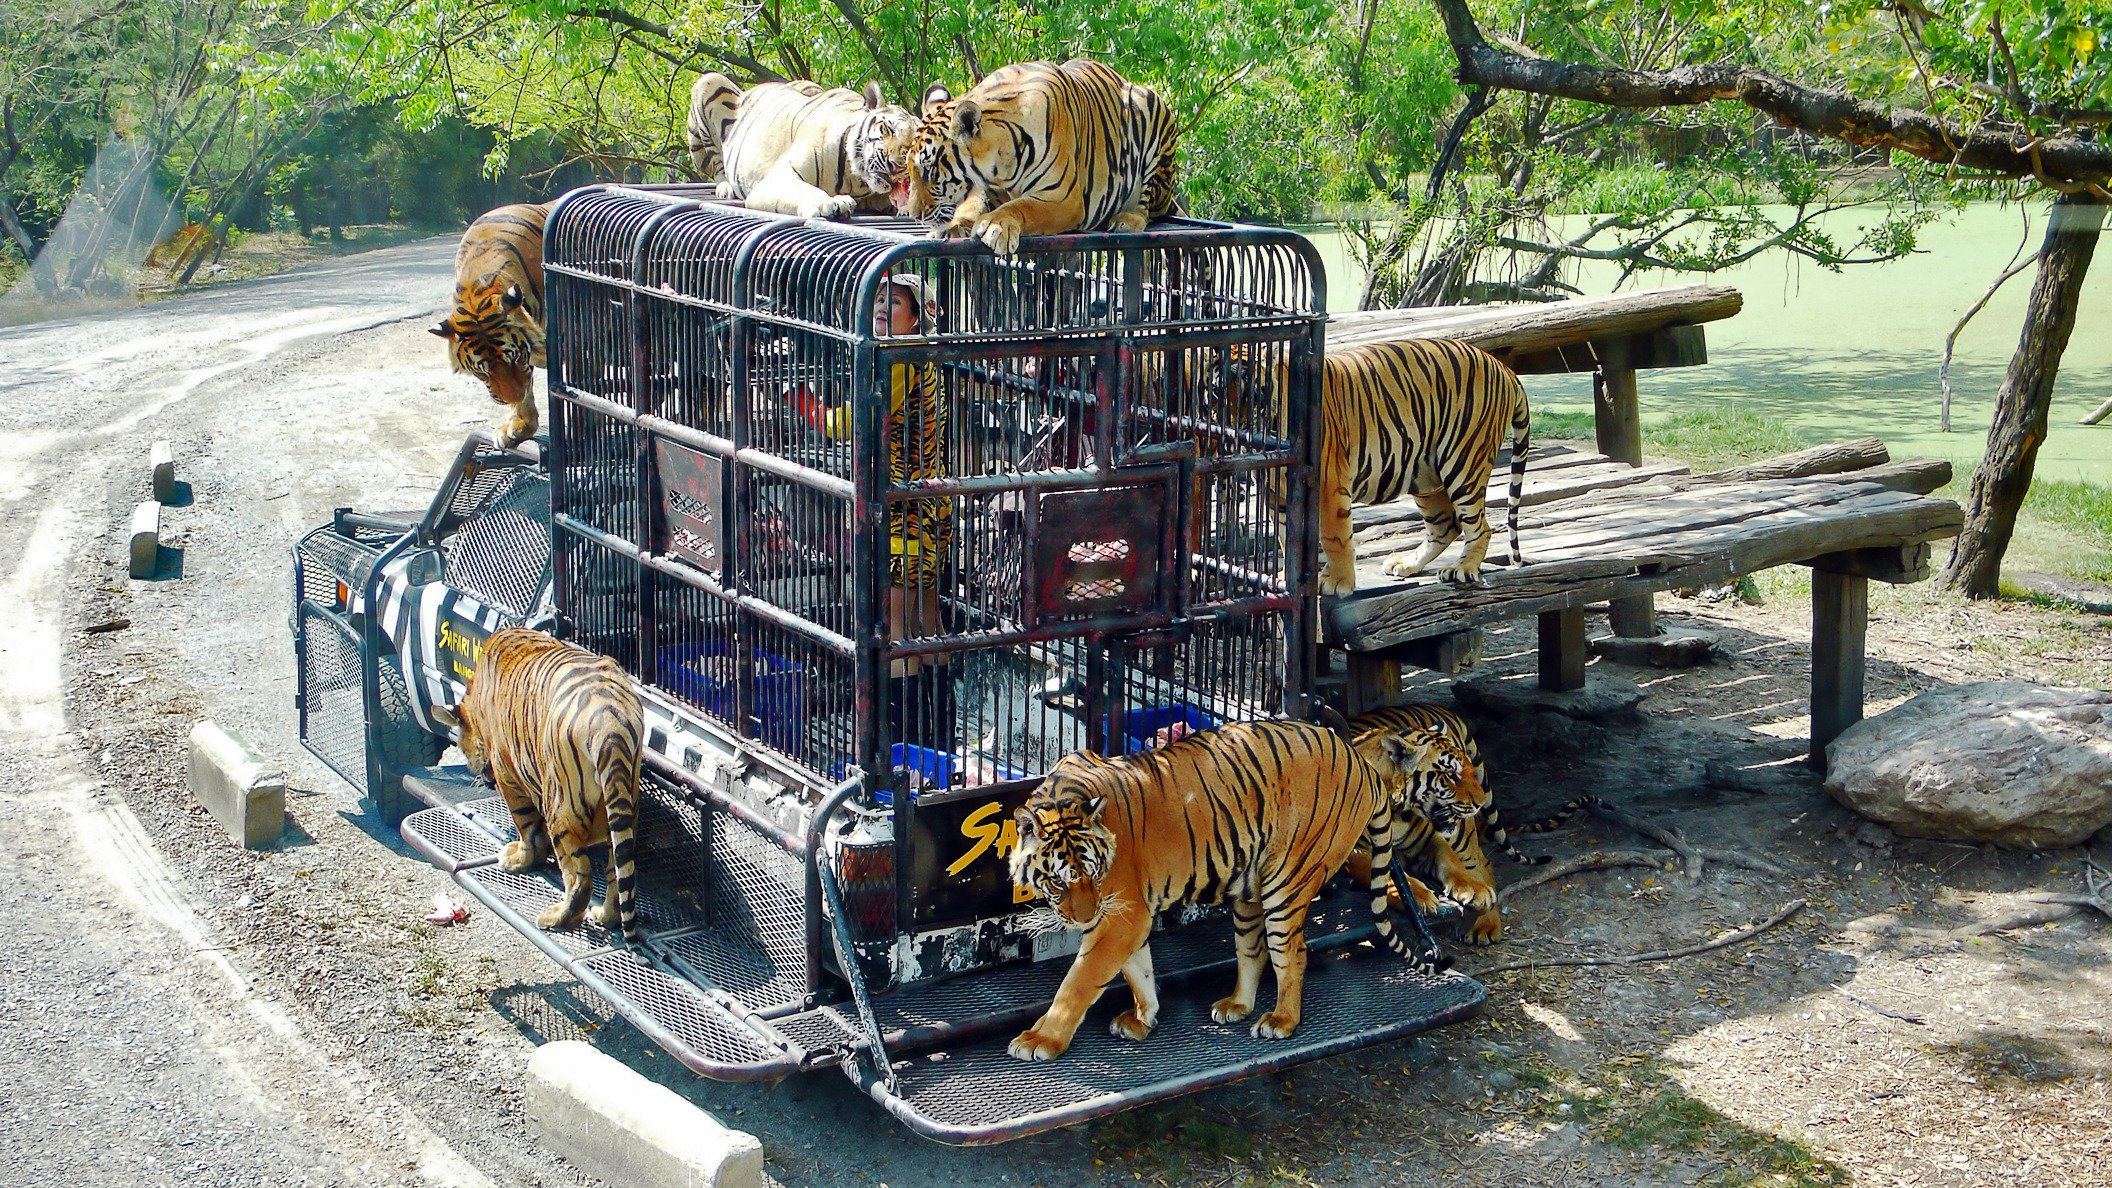 「Safari World」的圖片搜尋結果